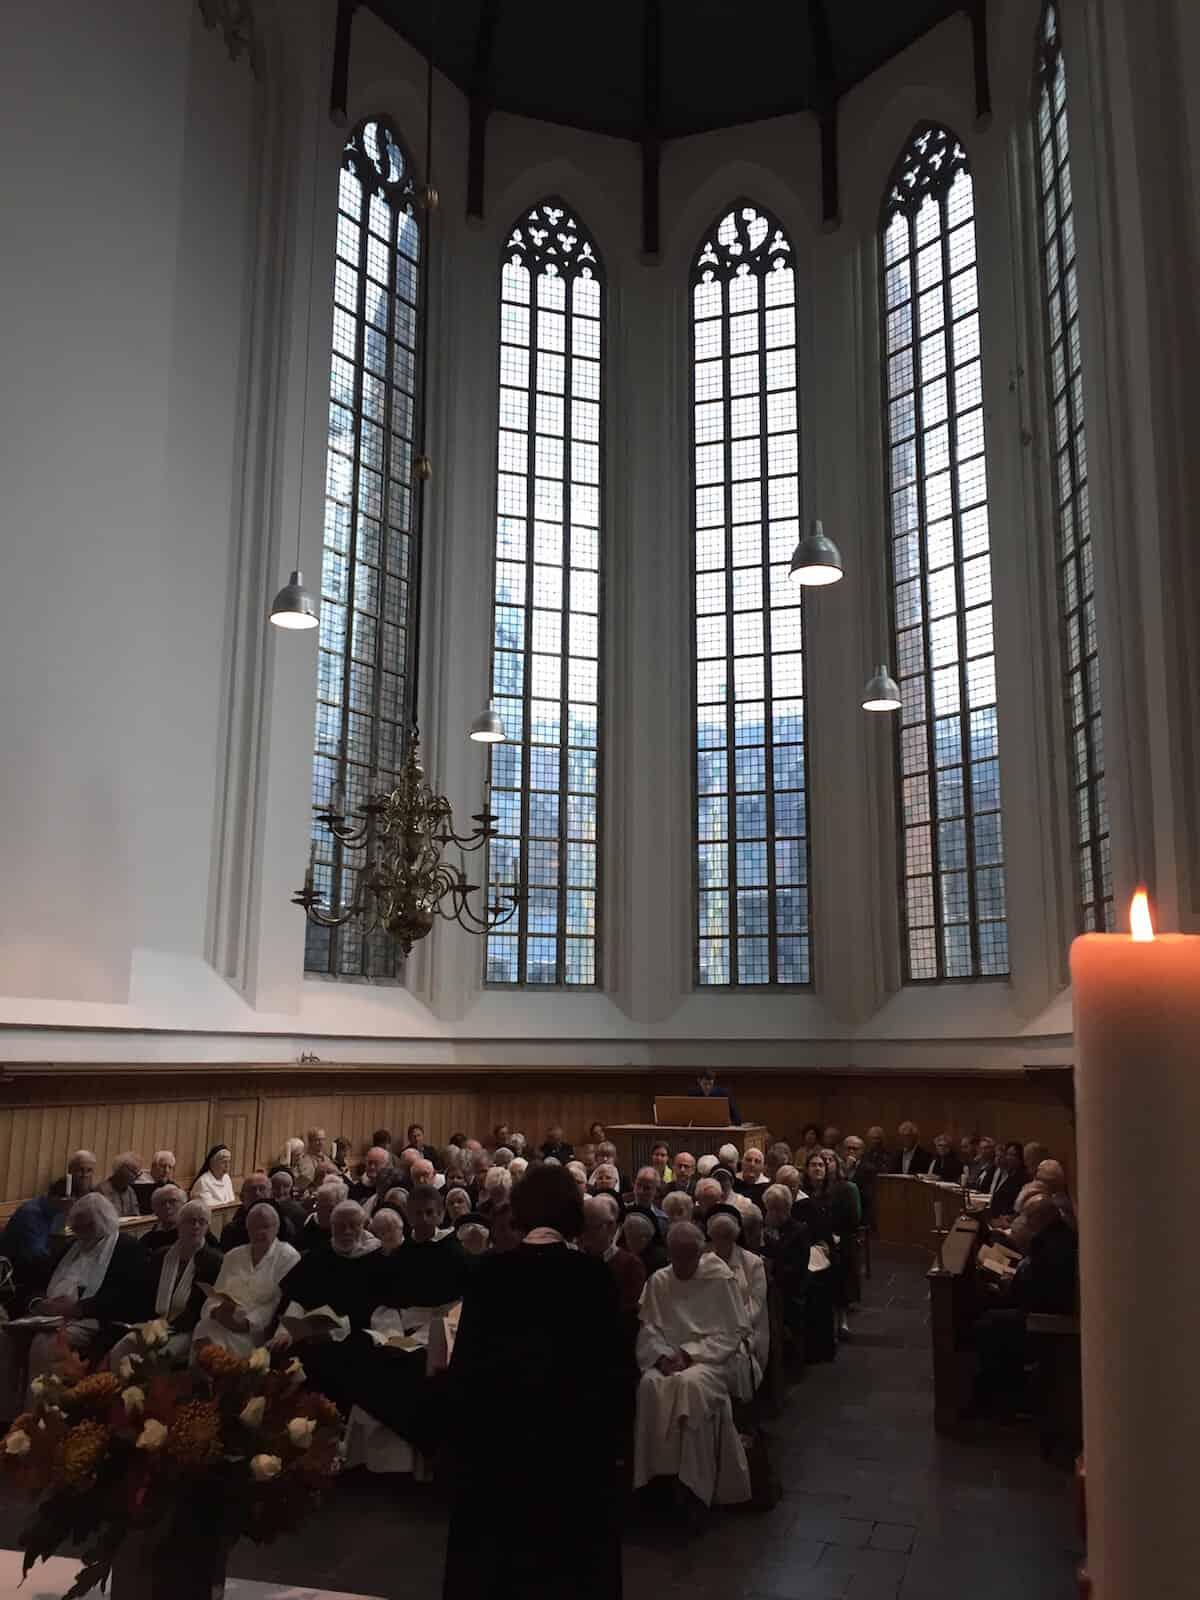 kloosterkerk den haag 22-10-2017-8